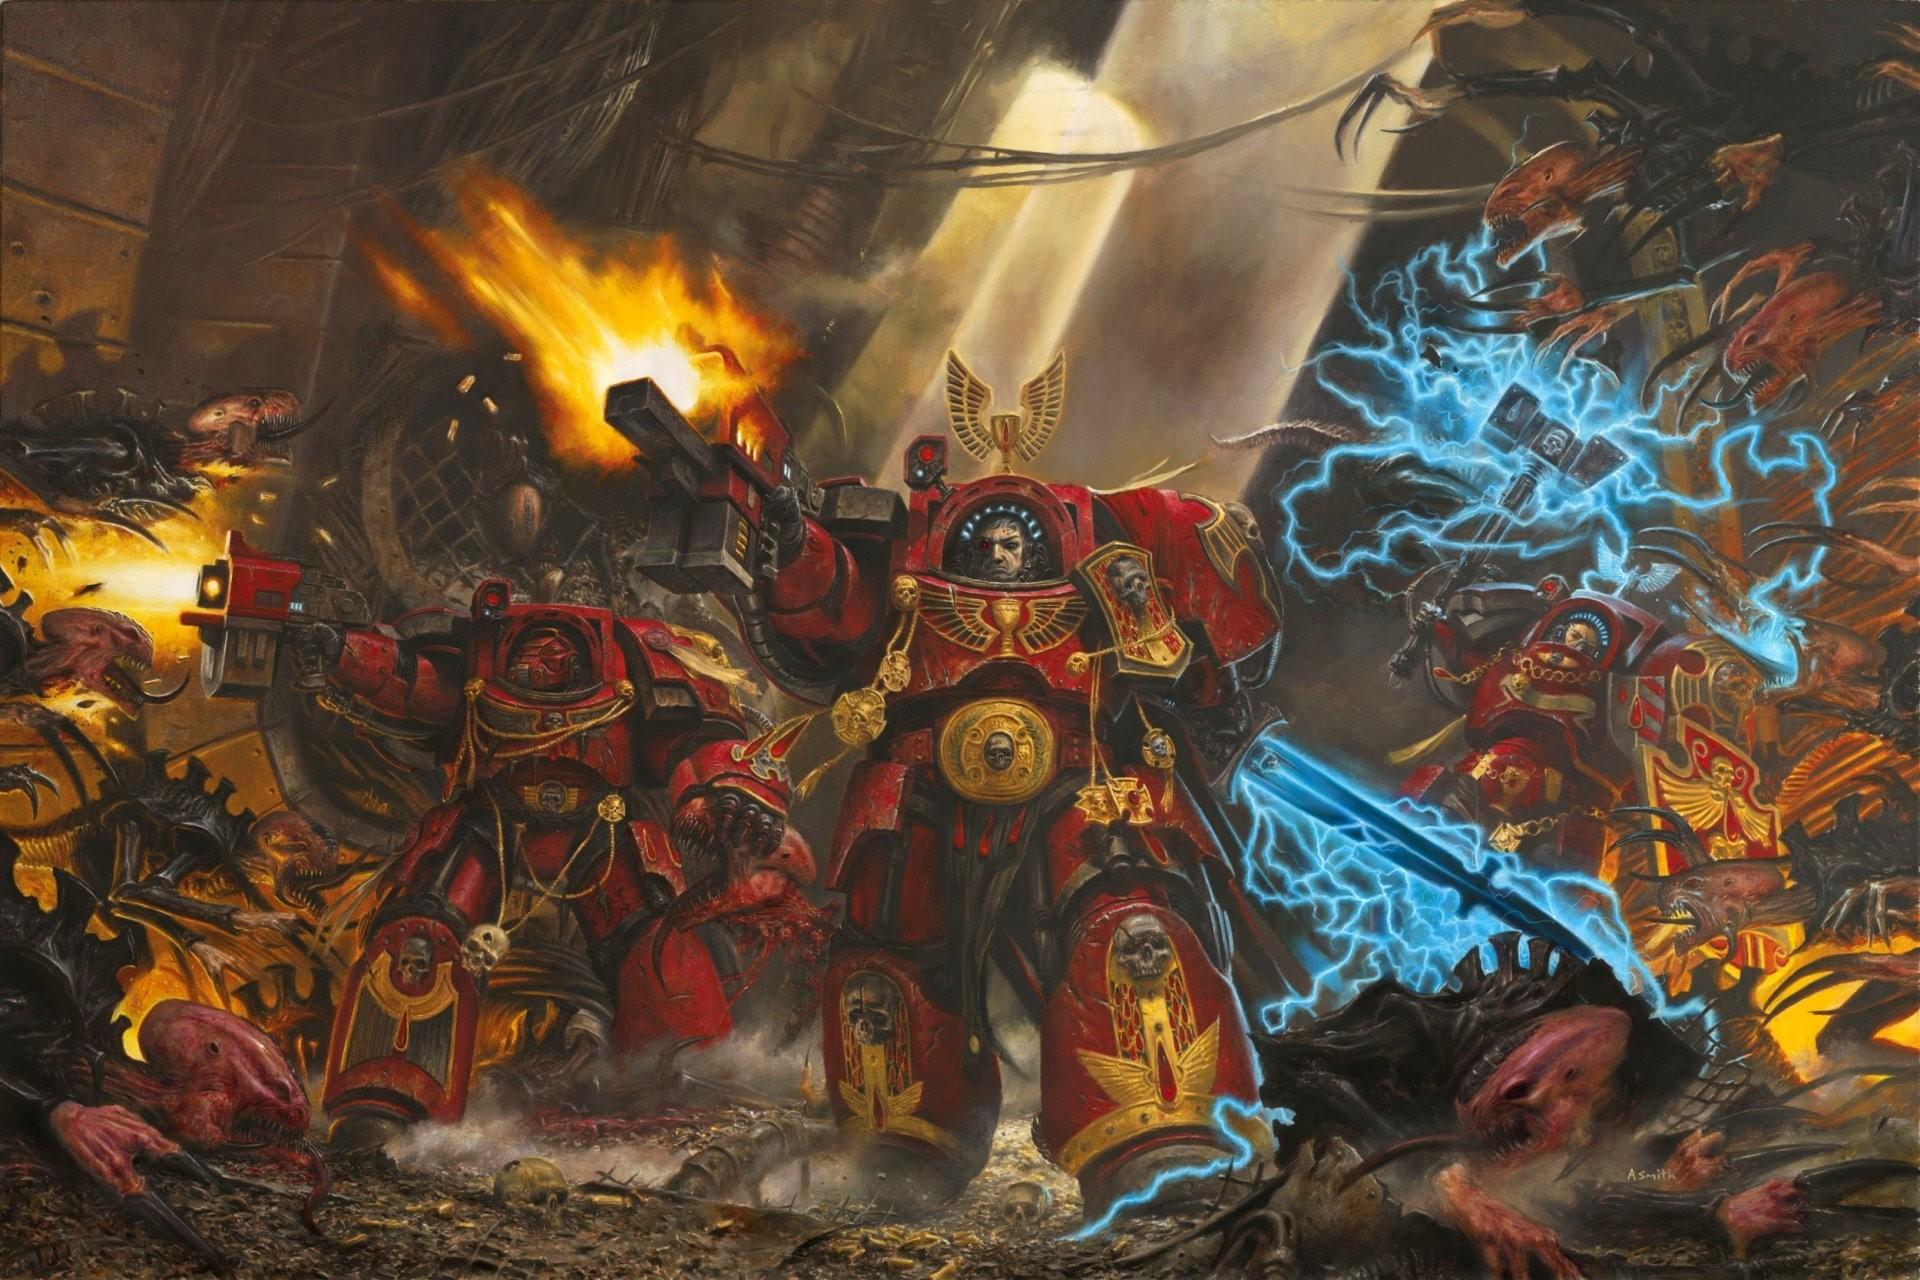 adrian smith spacehulk warhammer 40k space marines bloody angels blood  angels armour terminators tyranids genestealers bolter